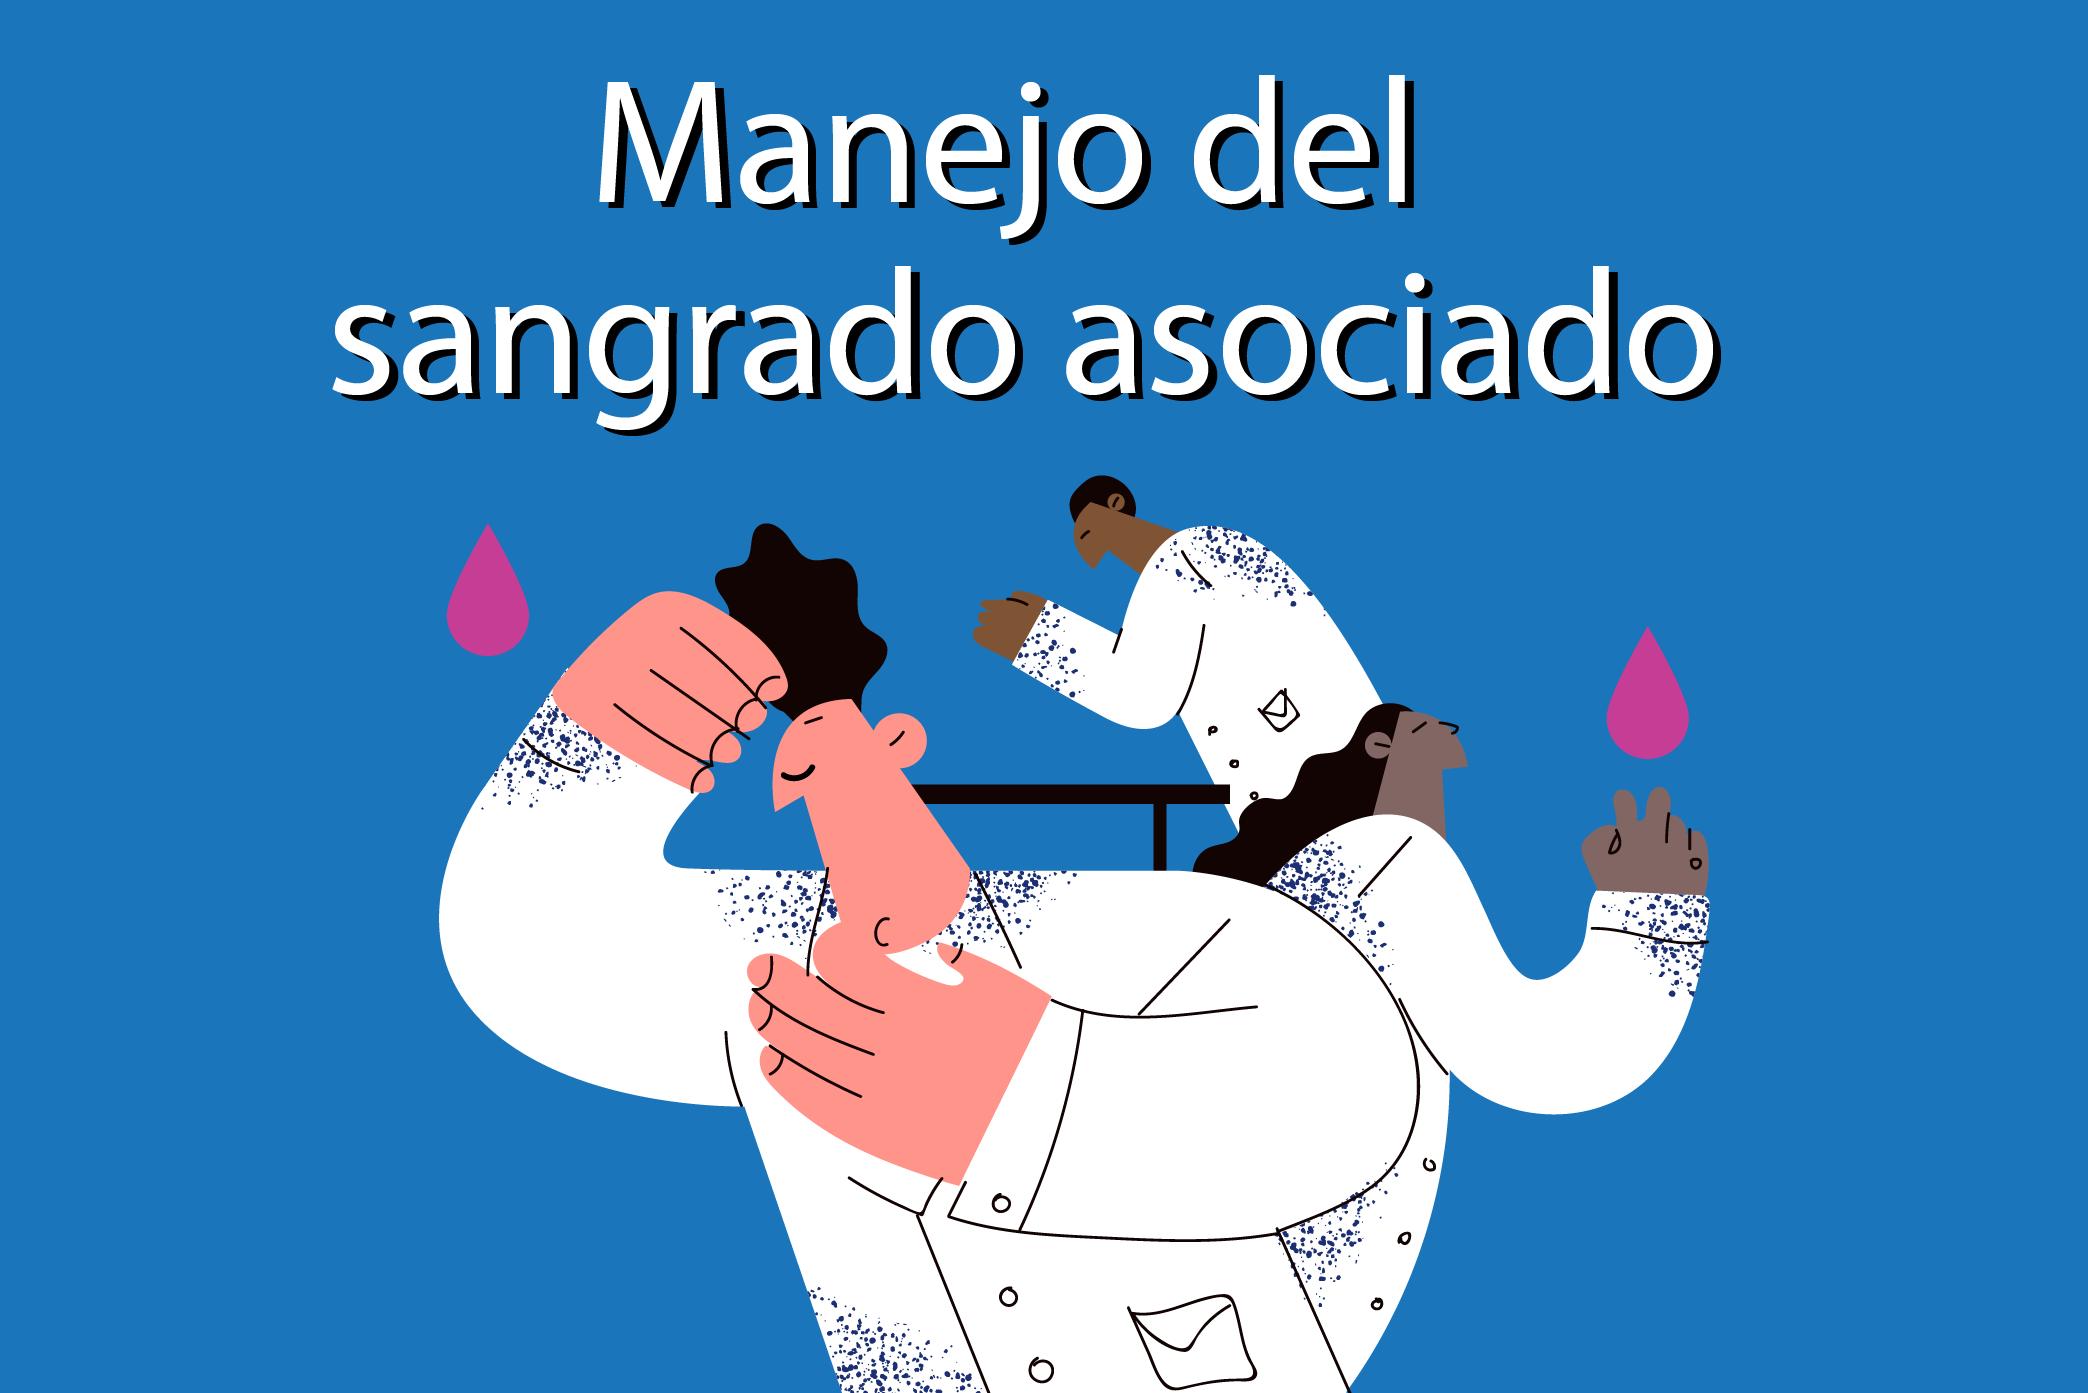 Manejo del sangrado asociado